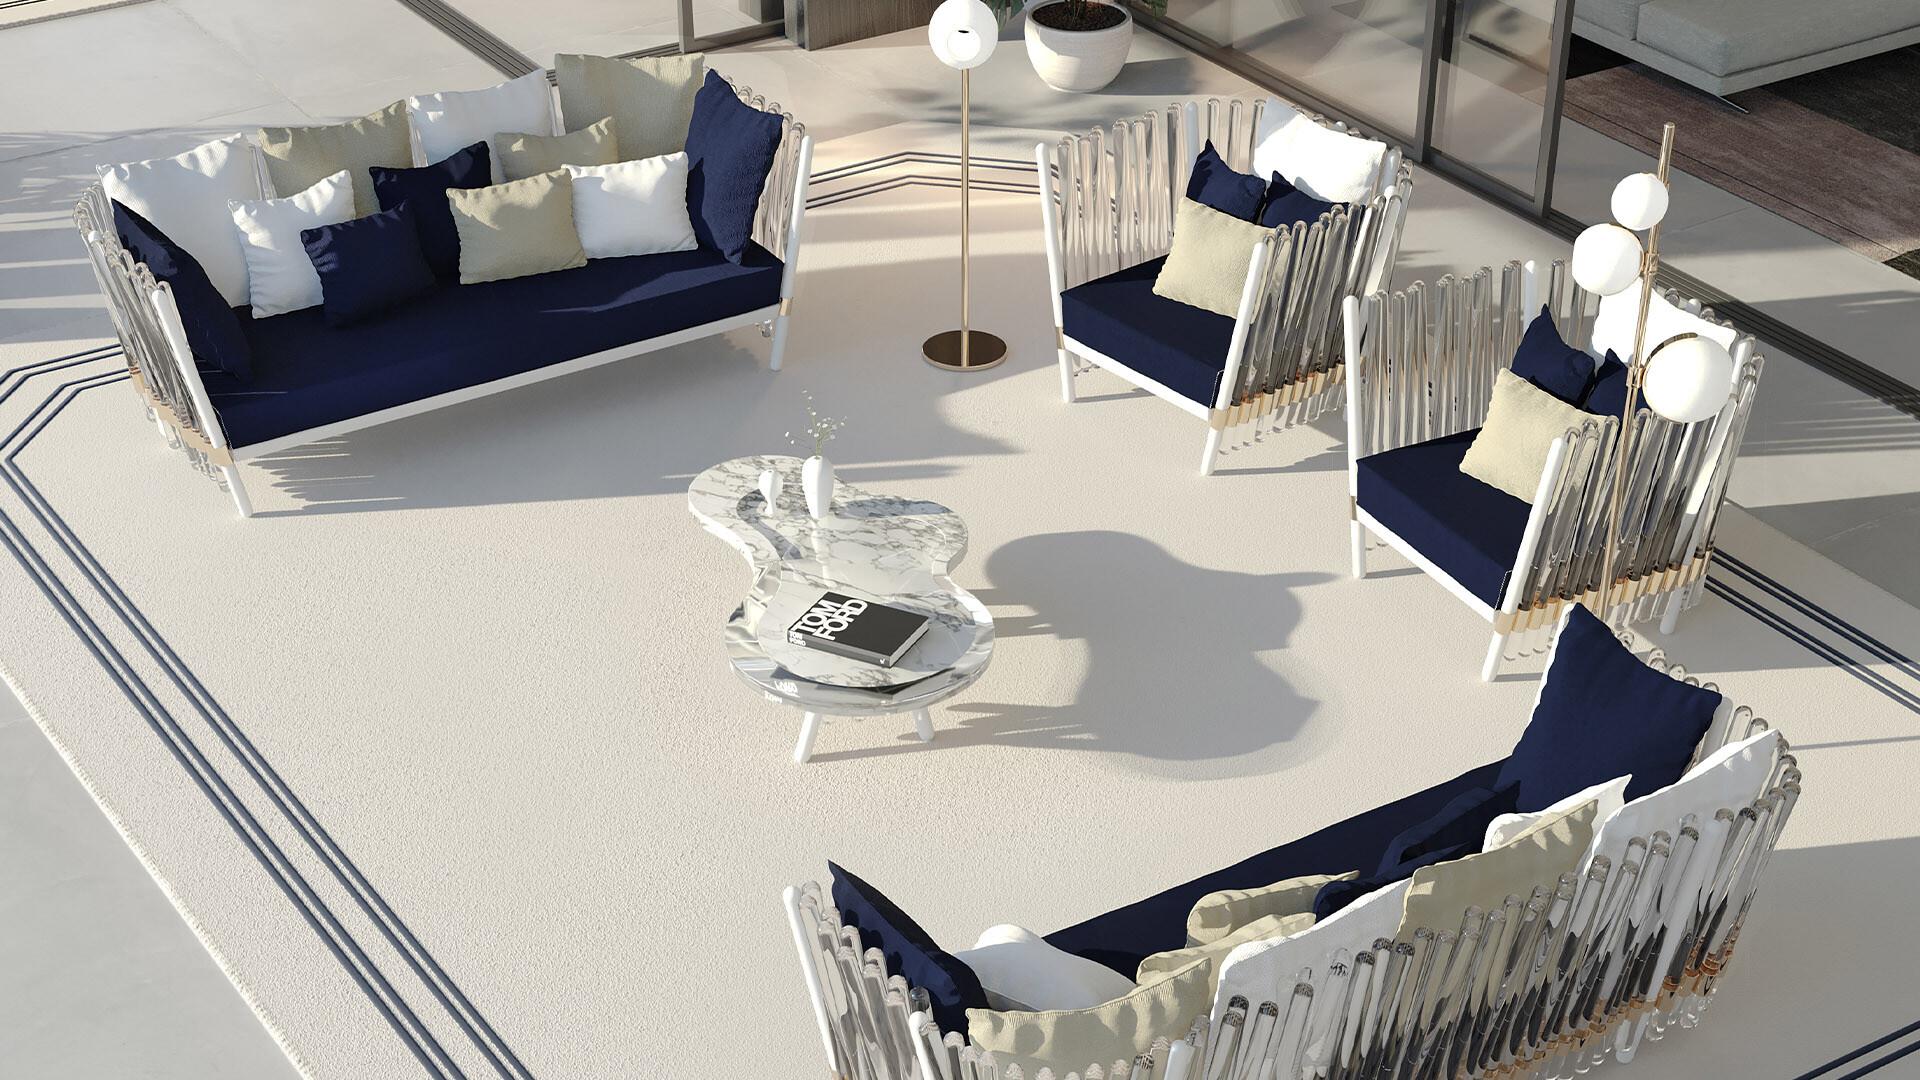 myface-miami-luxury-residence (2)